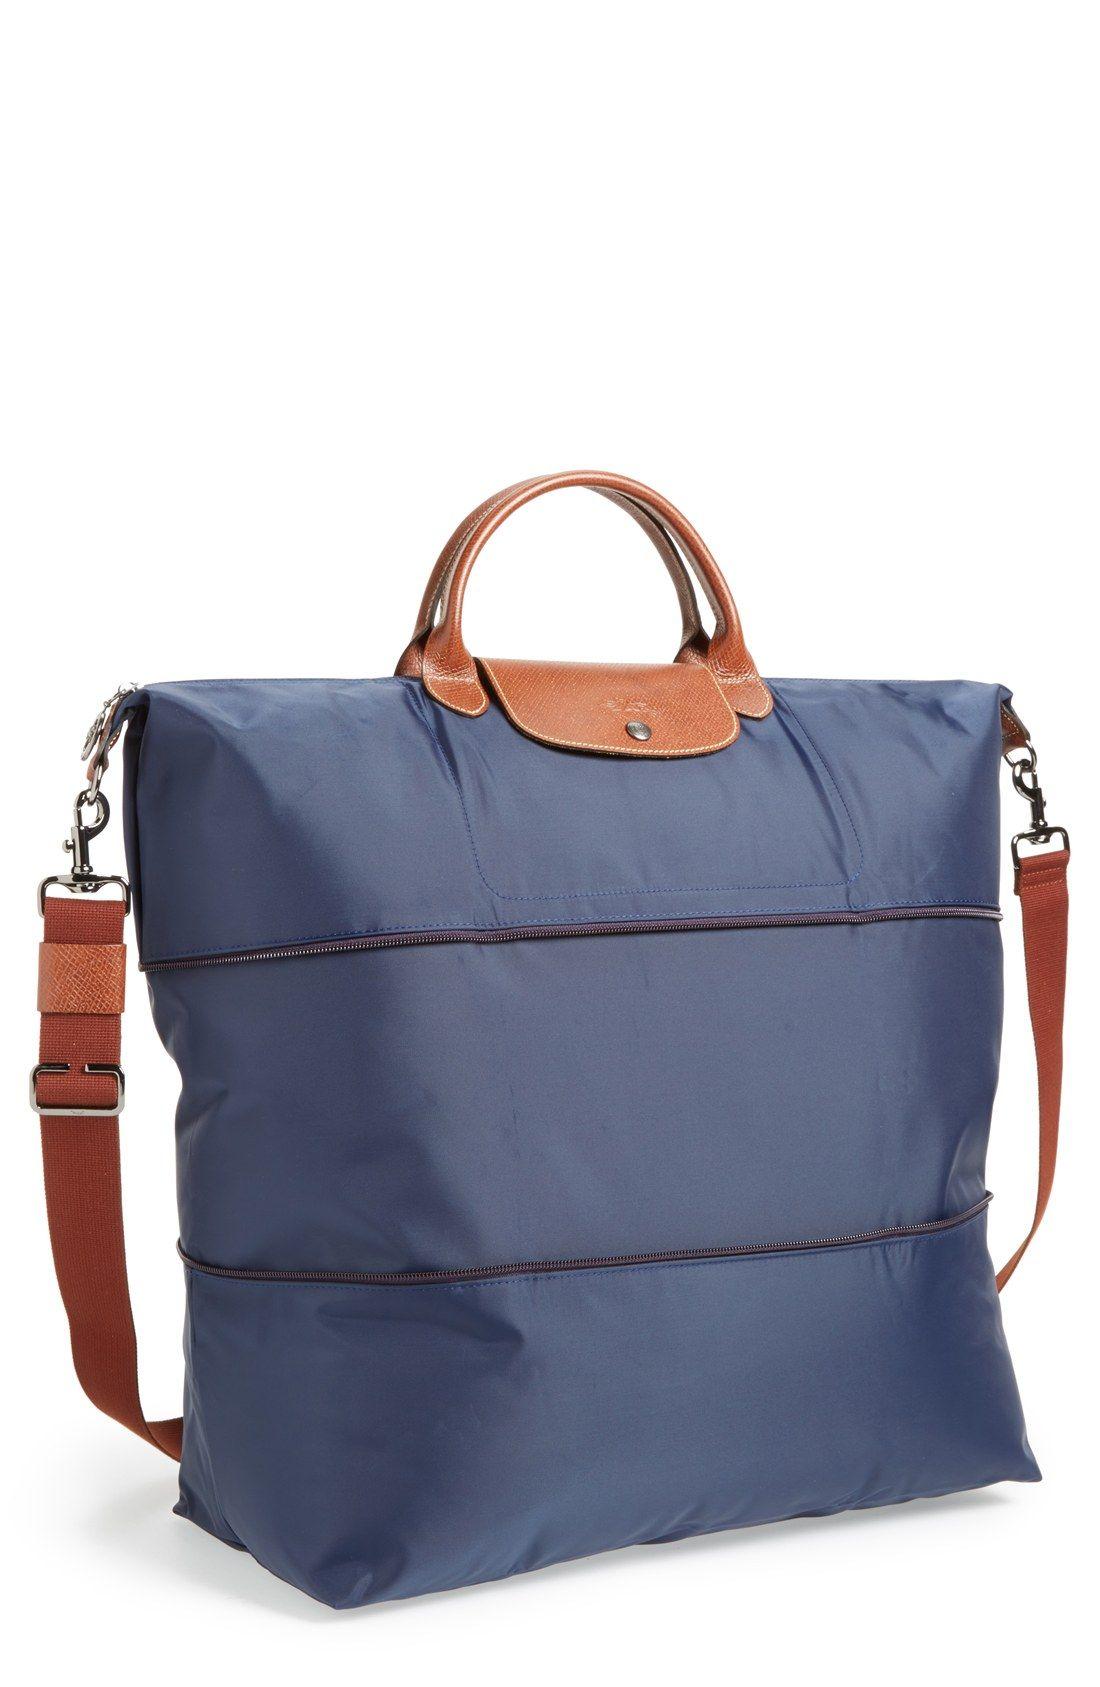 Longchamp  Le Pliage  Expandable Travel Bag - 21 Inch (  255)  b63298f471ee9